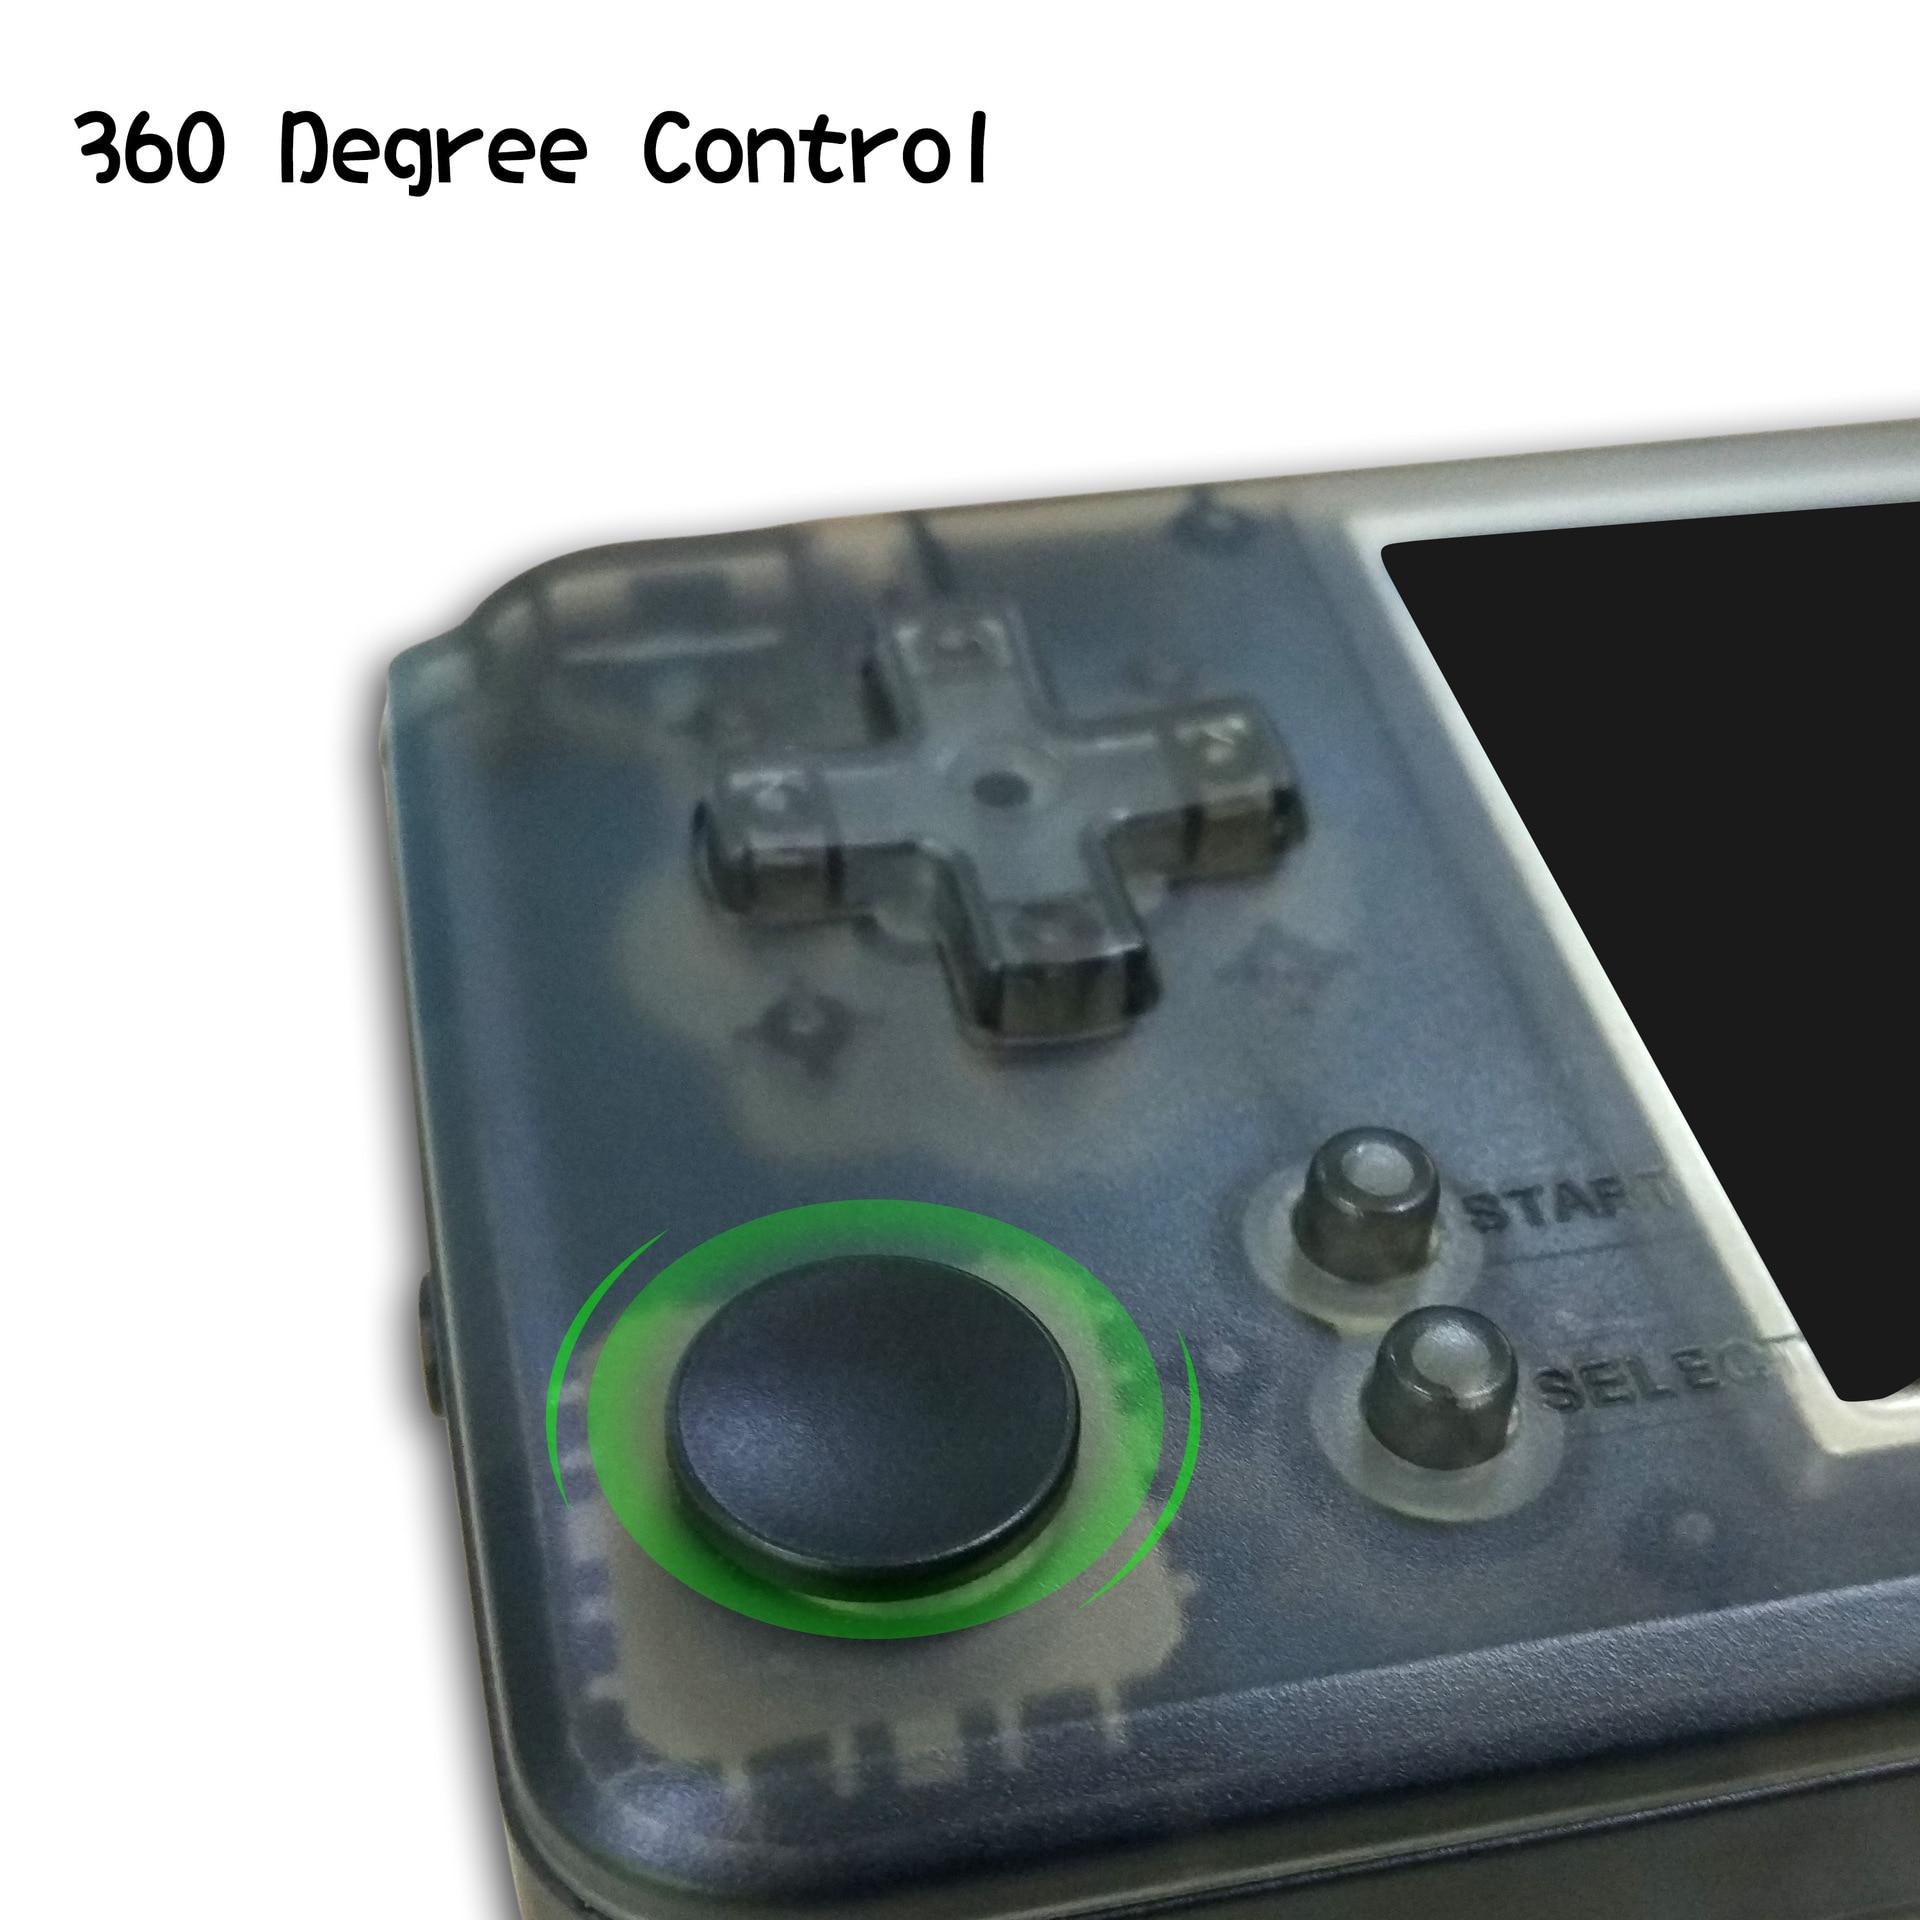 3000 Games Retro Handheld Game Console 60Hz Portable Consoles 3